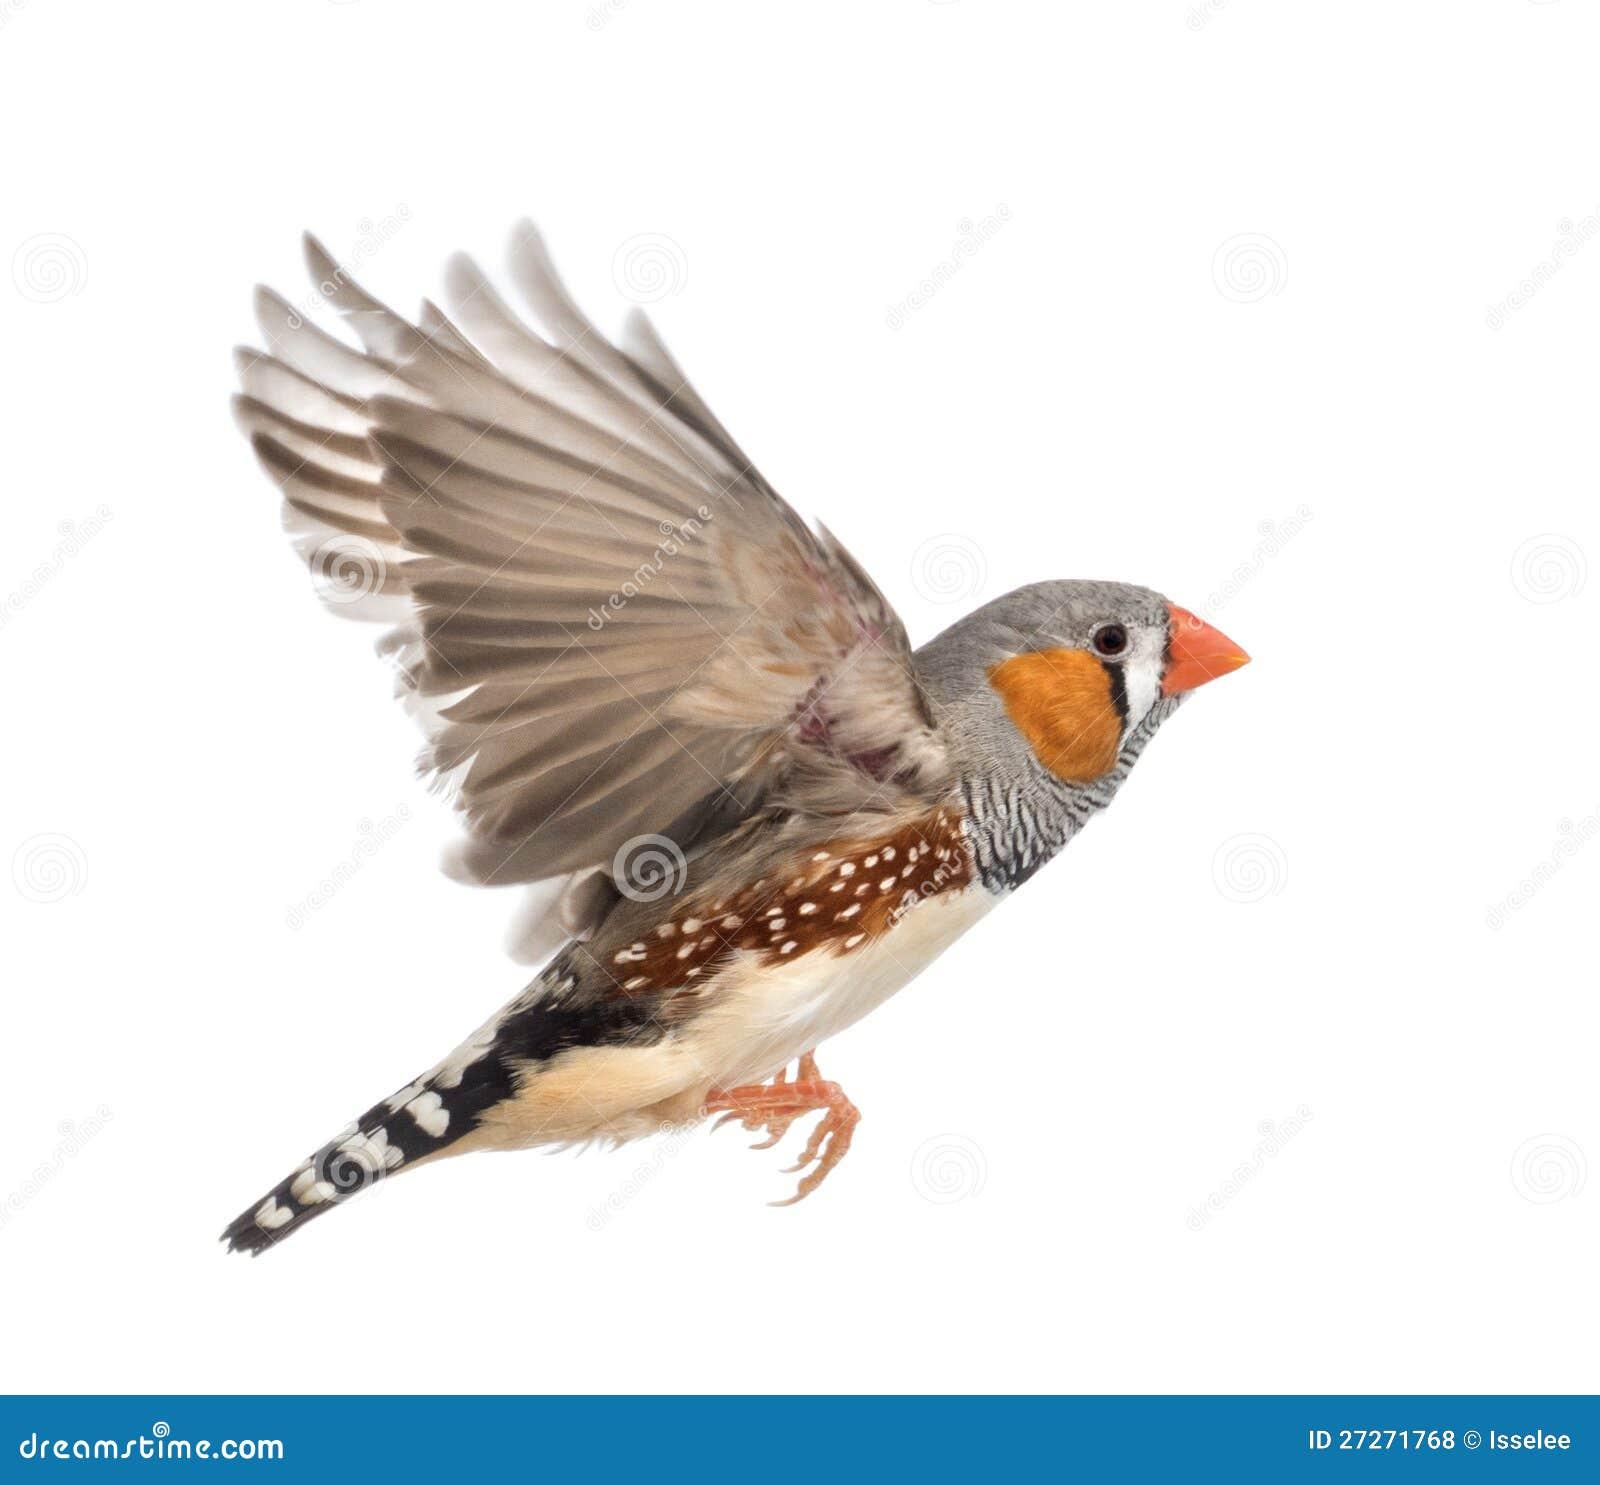 Bird house clipart free download clip art free clip art on - Zebra Finch Flying Taeniopygia Guttata Royalty Free Stock